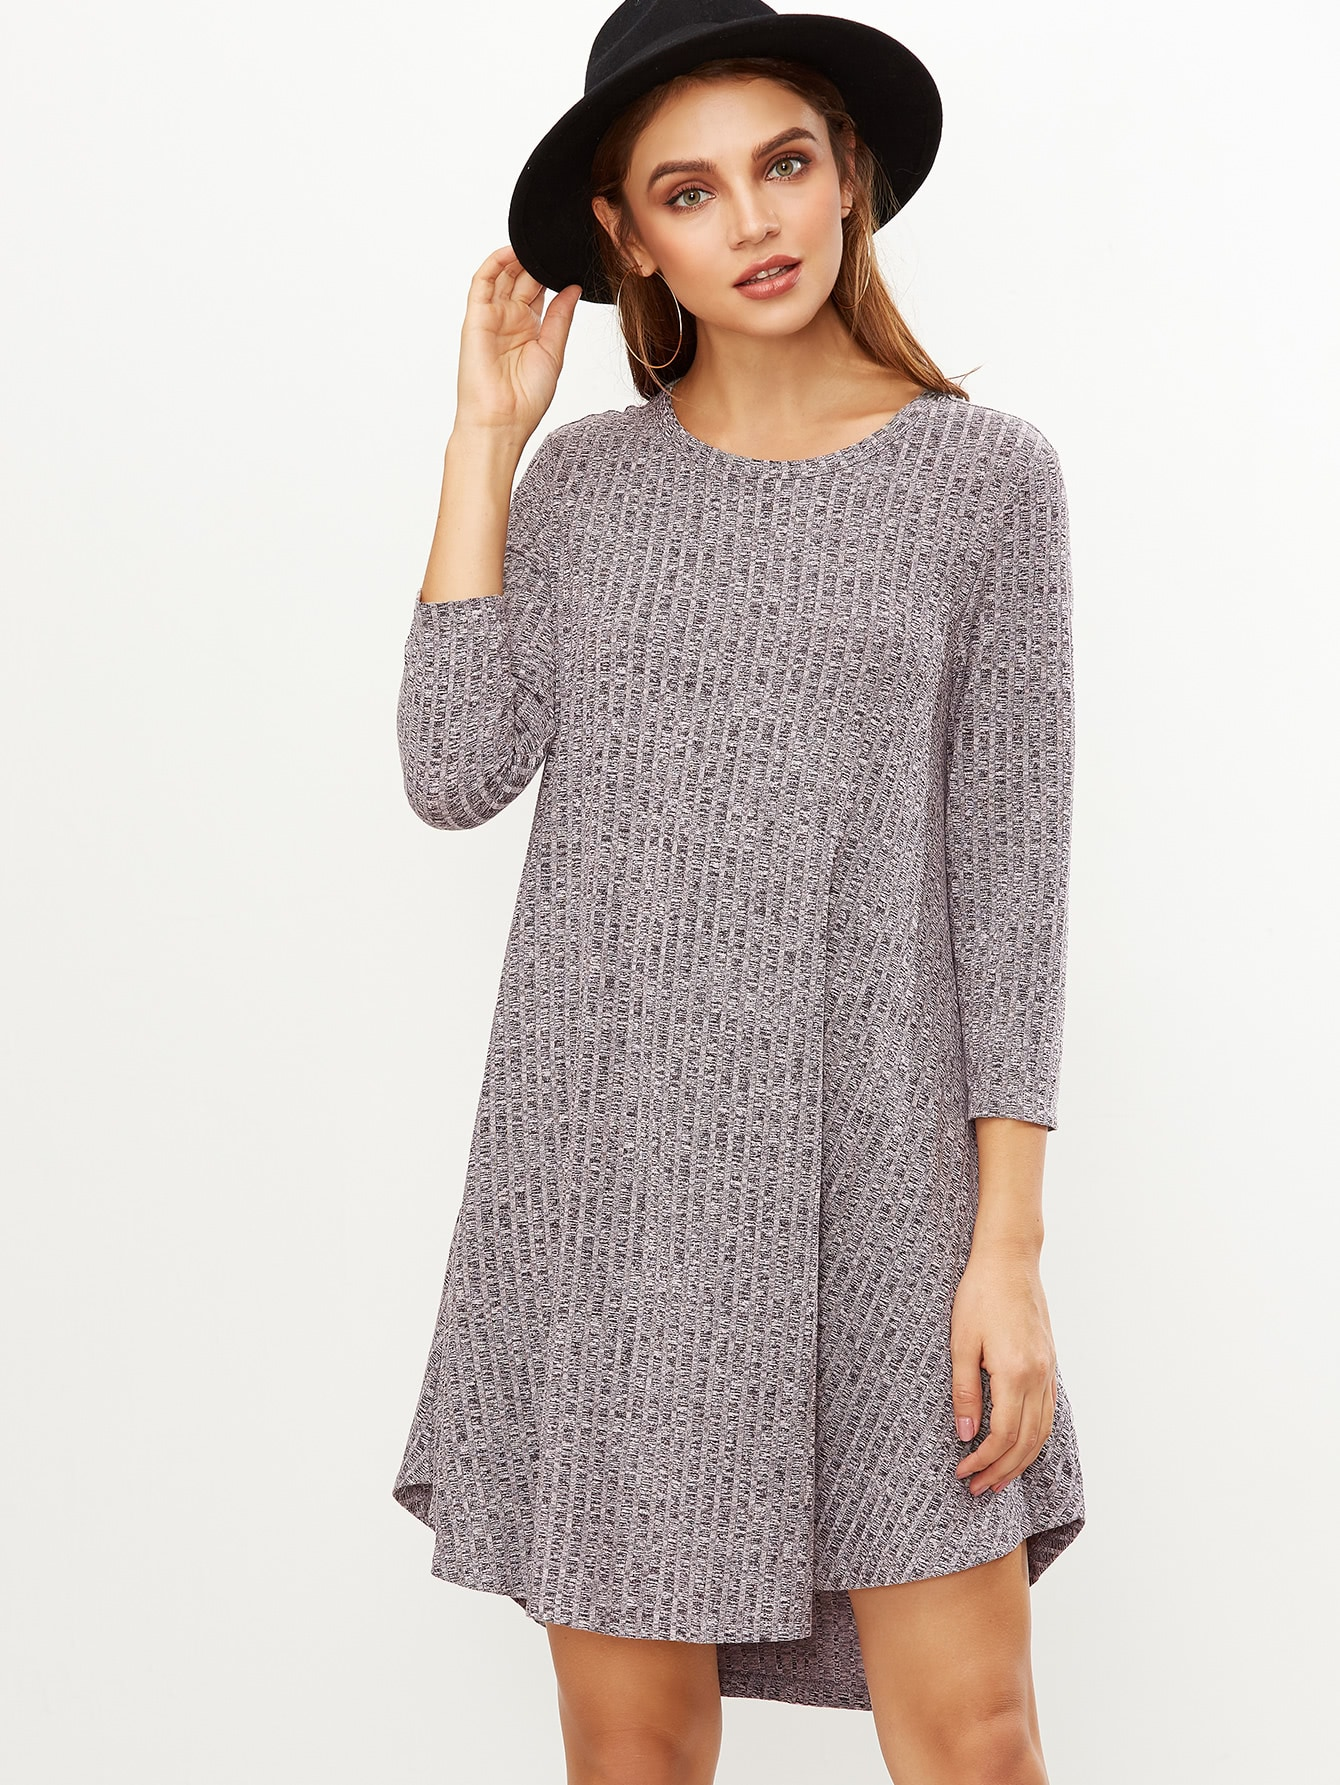 Grey Marled Knit Ribbed Swing Dress dress161110722